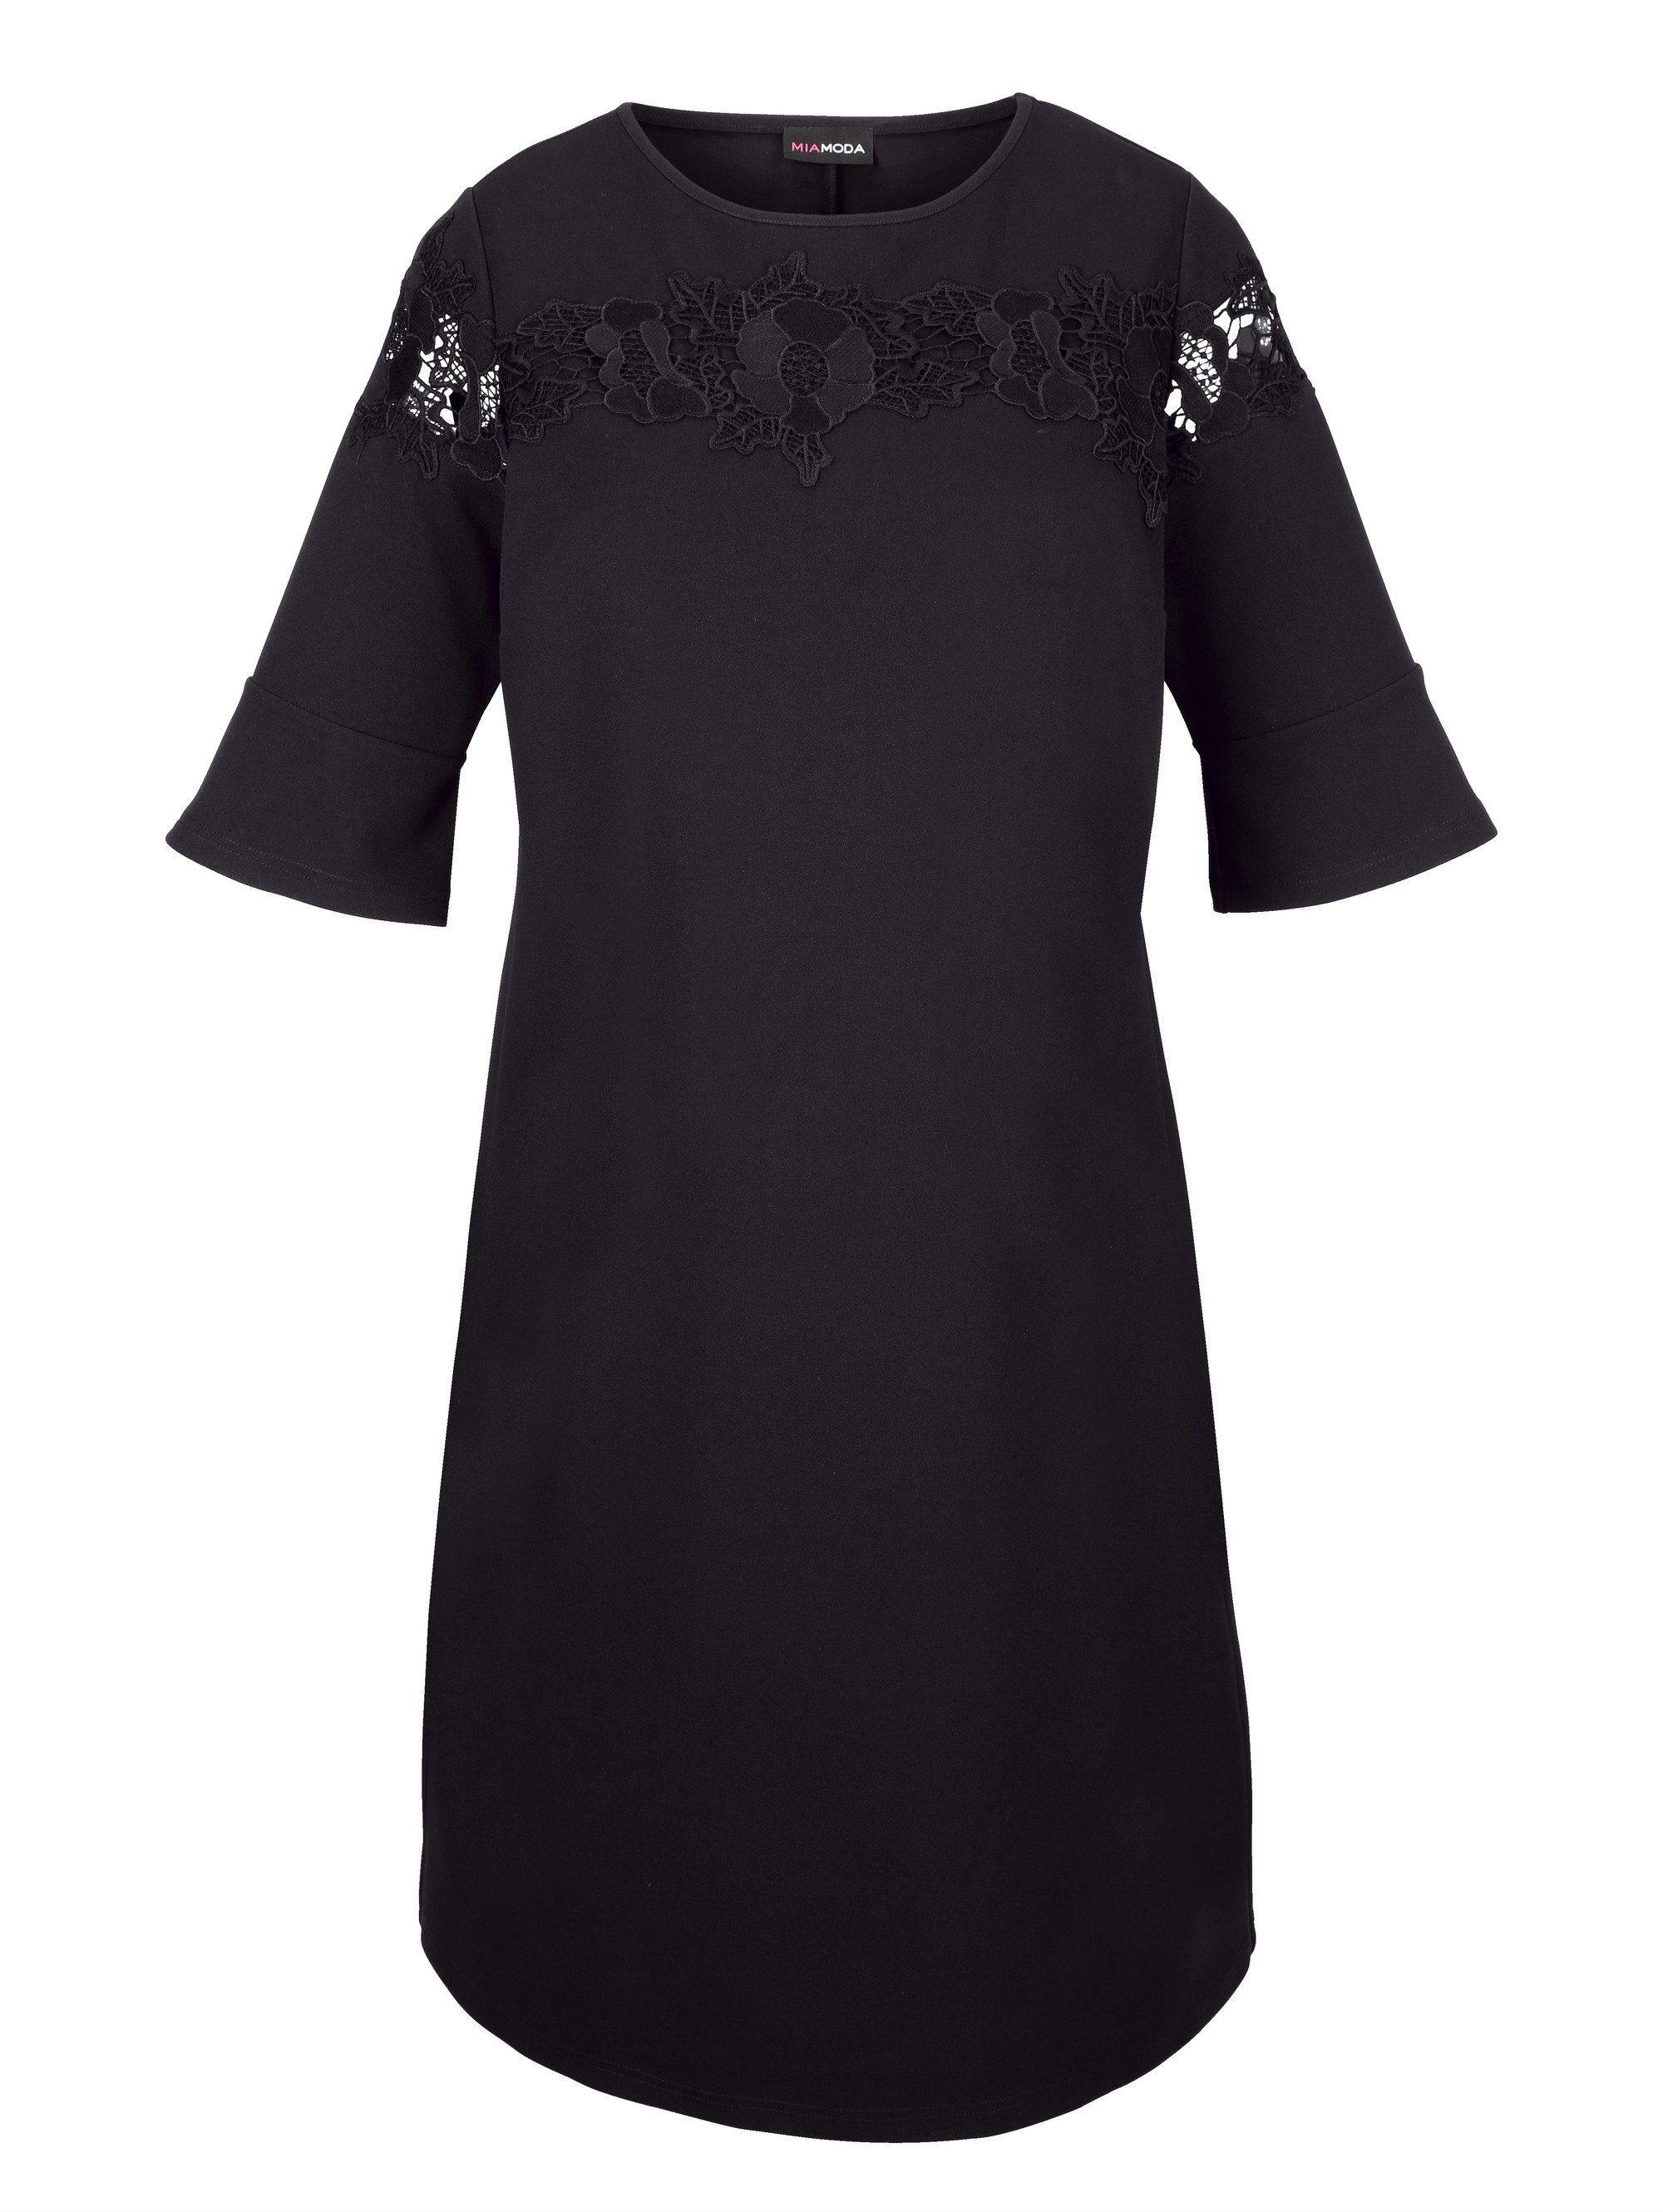 MIAMODA Kleid mit edler Spitzenapplikation